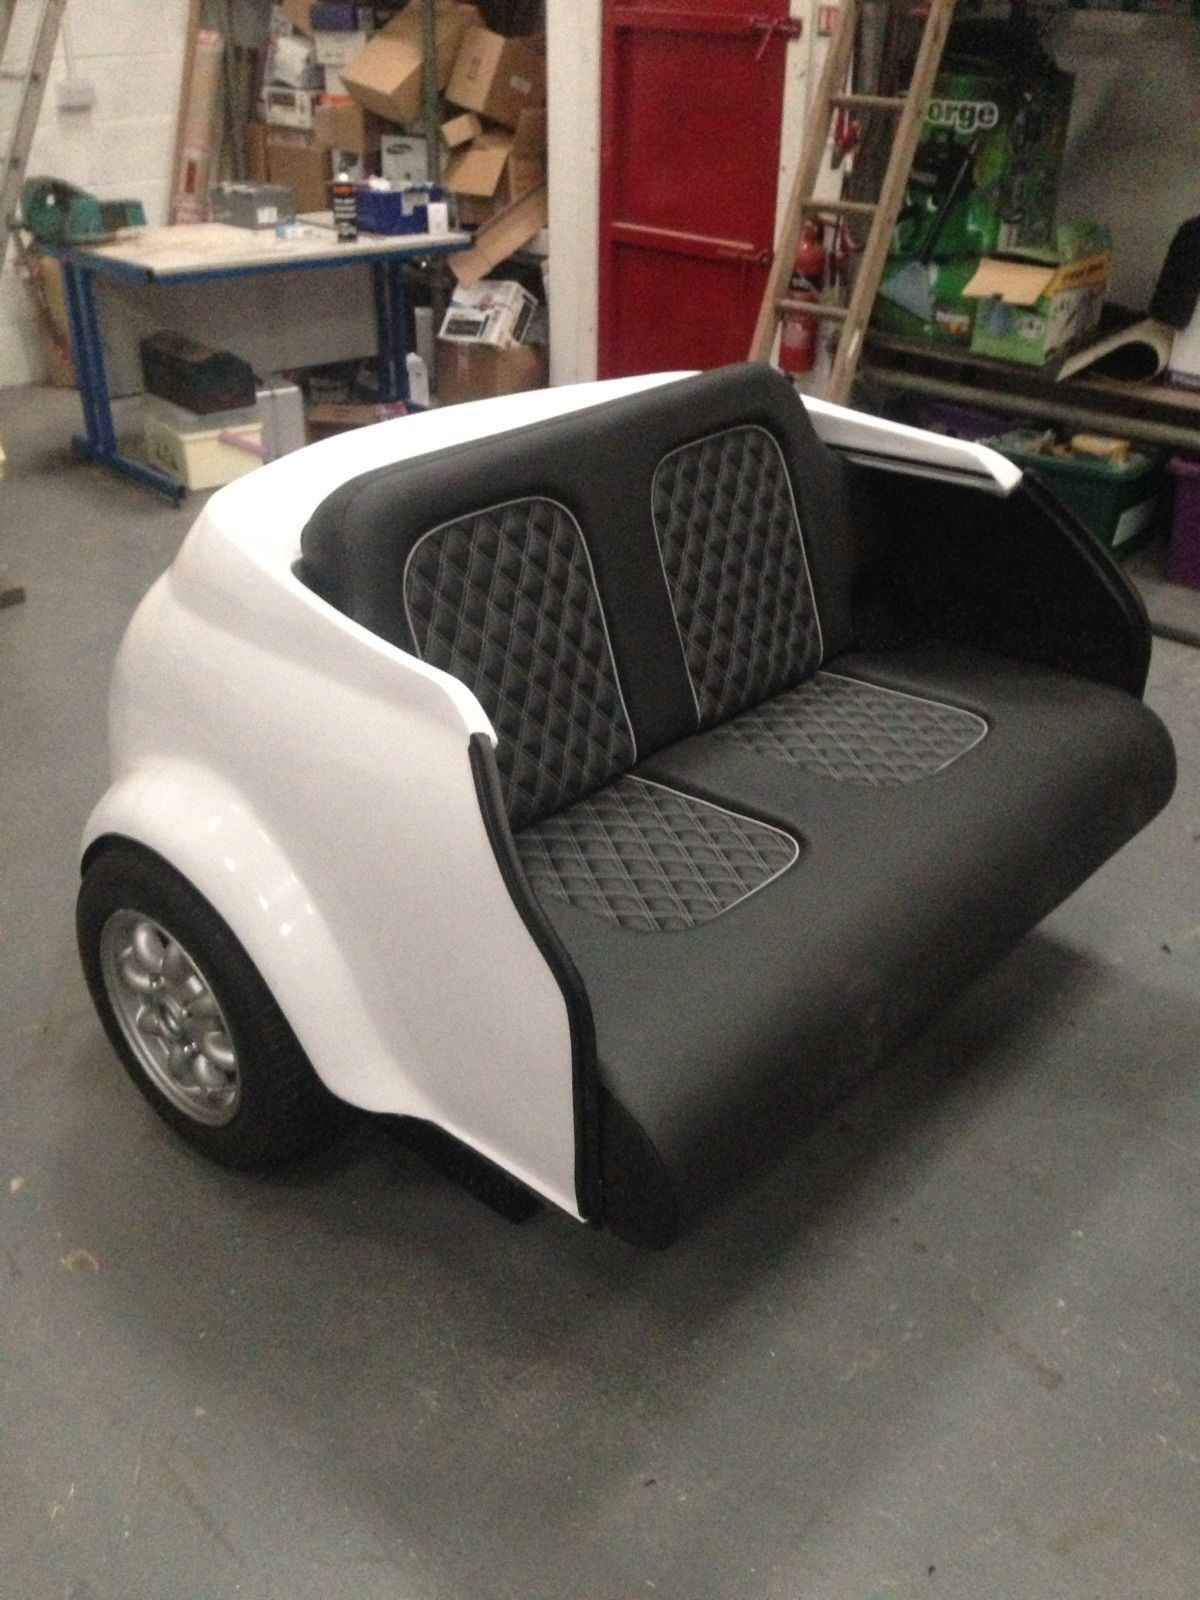 Mini Sofa Chair Sure Fit Recliner Covers Australia Classic White Cooper Amazing Car Transformed